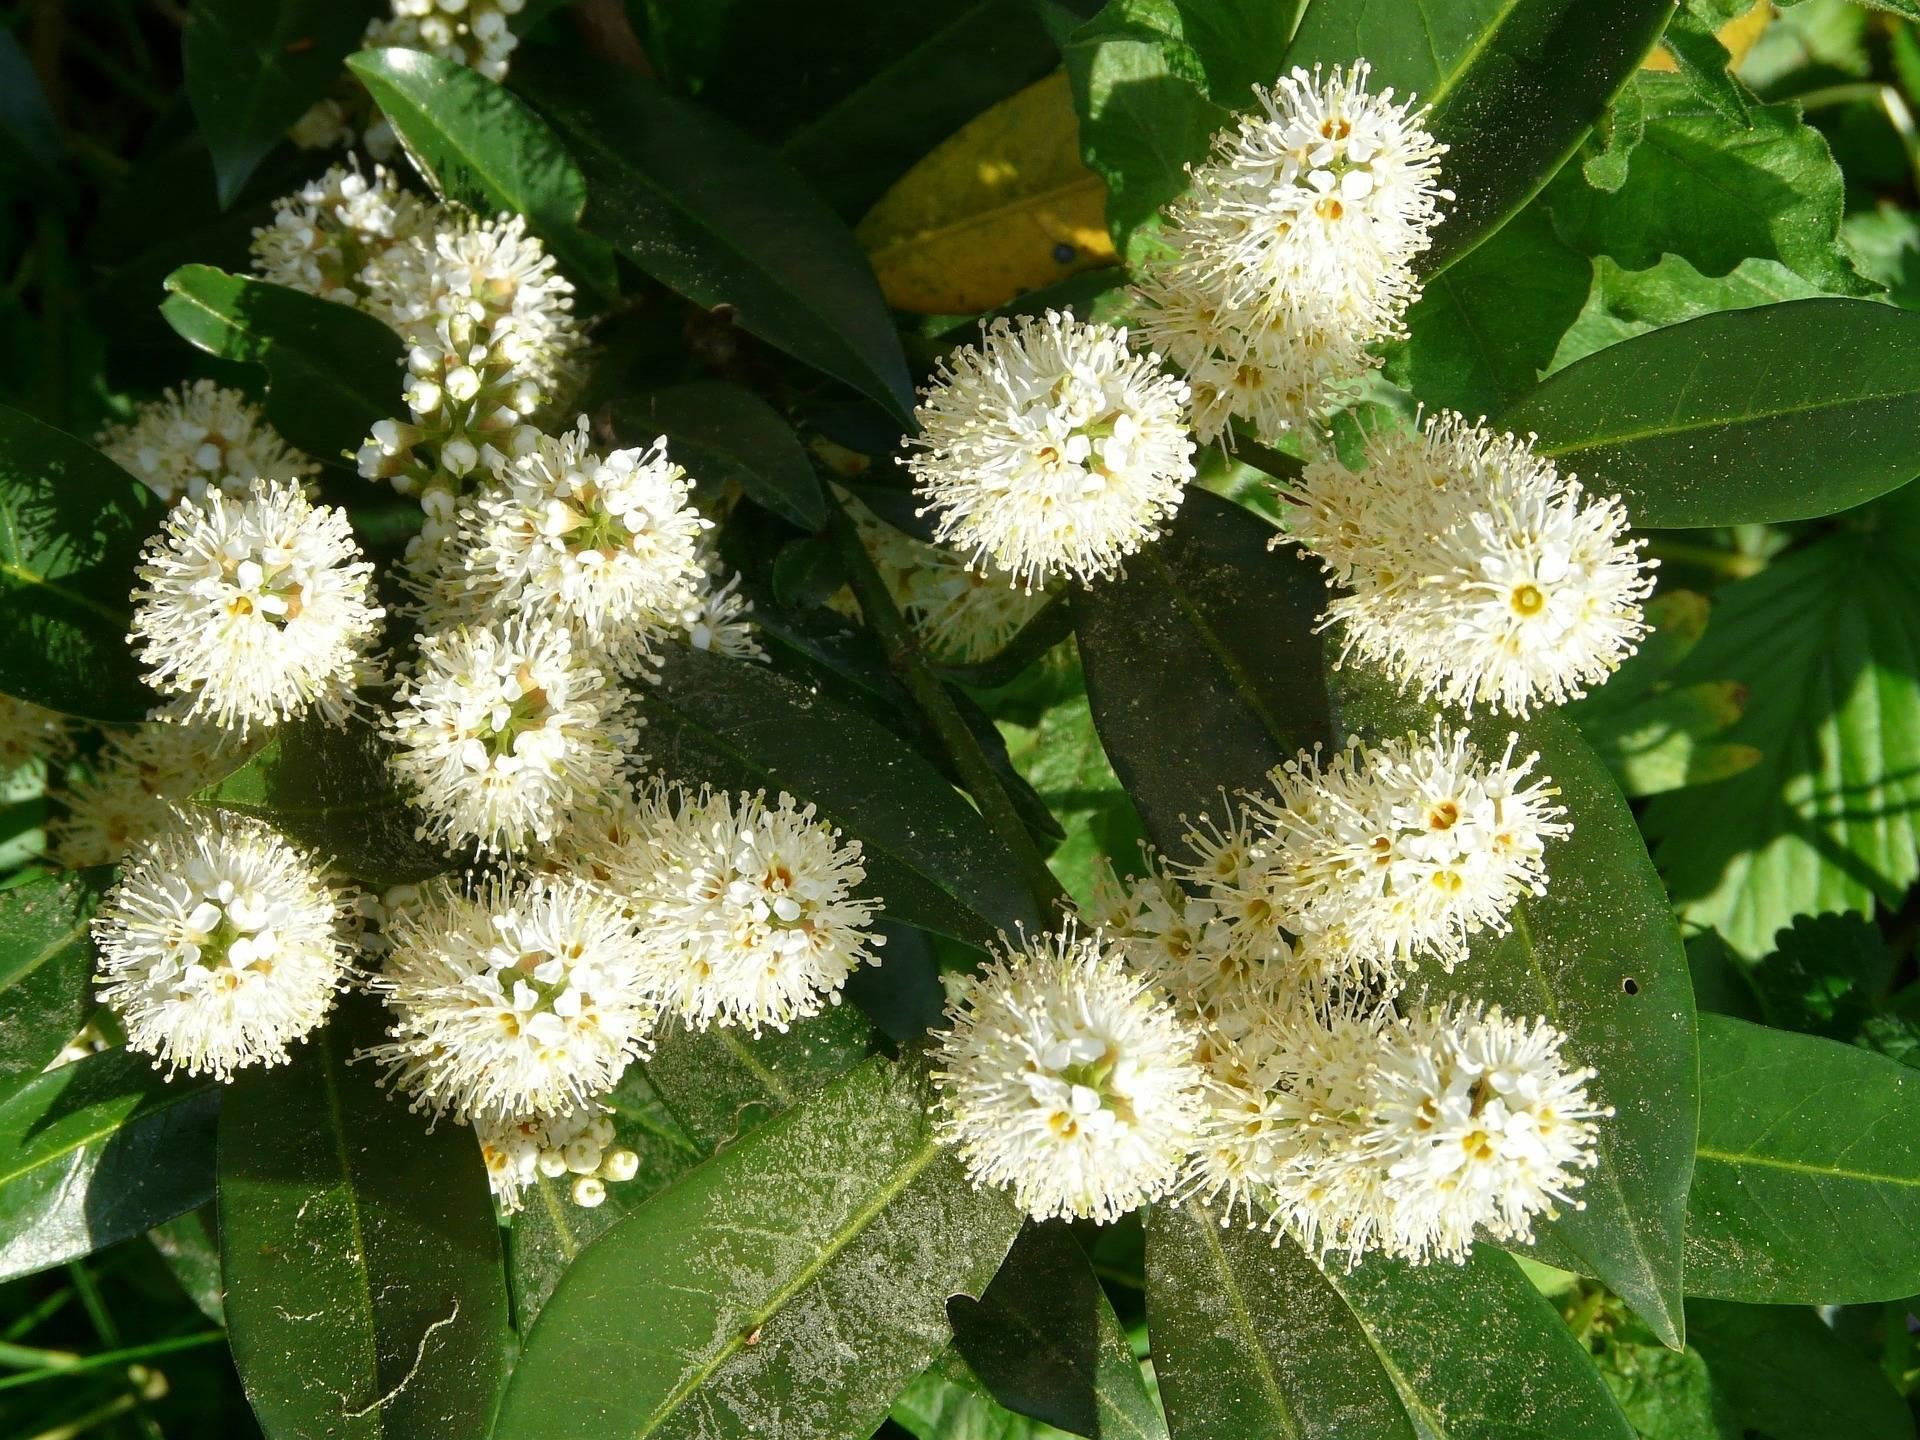 Laurierboom op stam Prunus laurocerasus Otto luyken